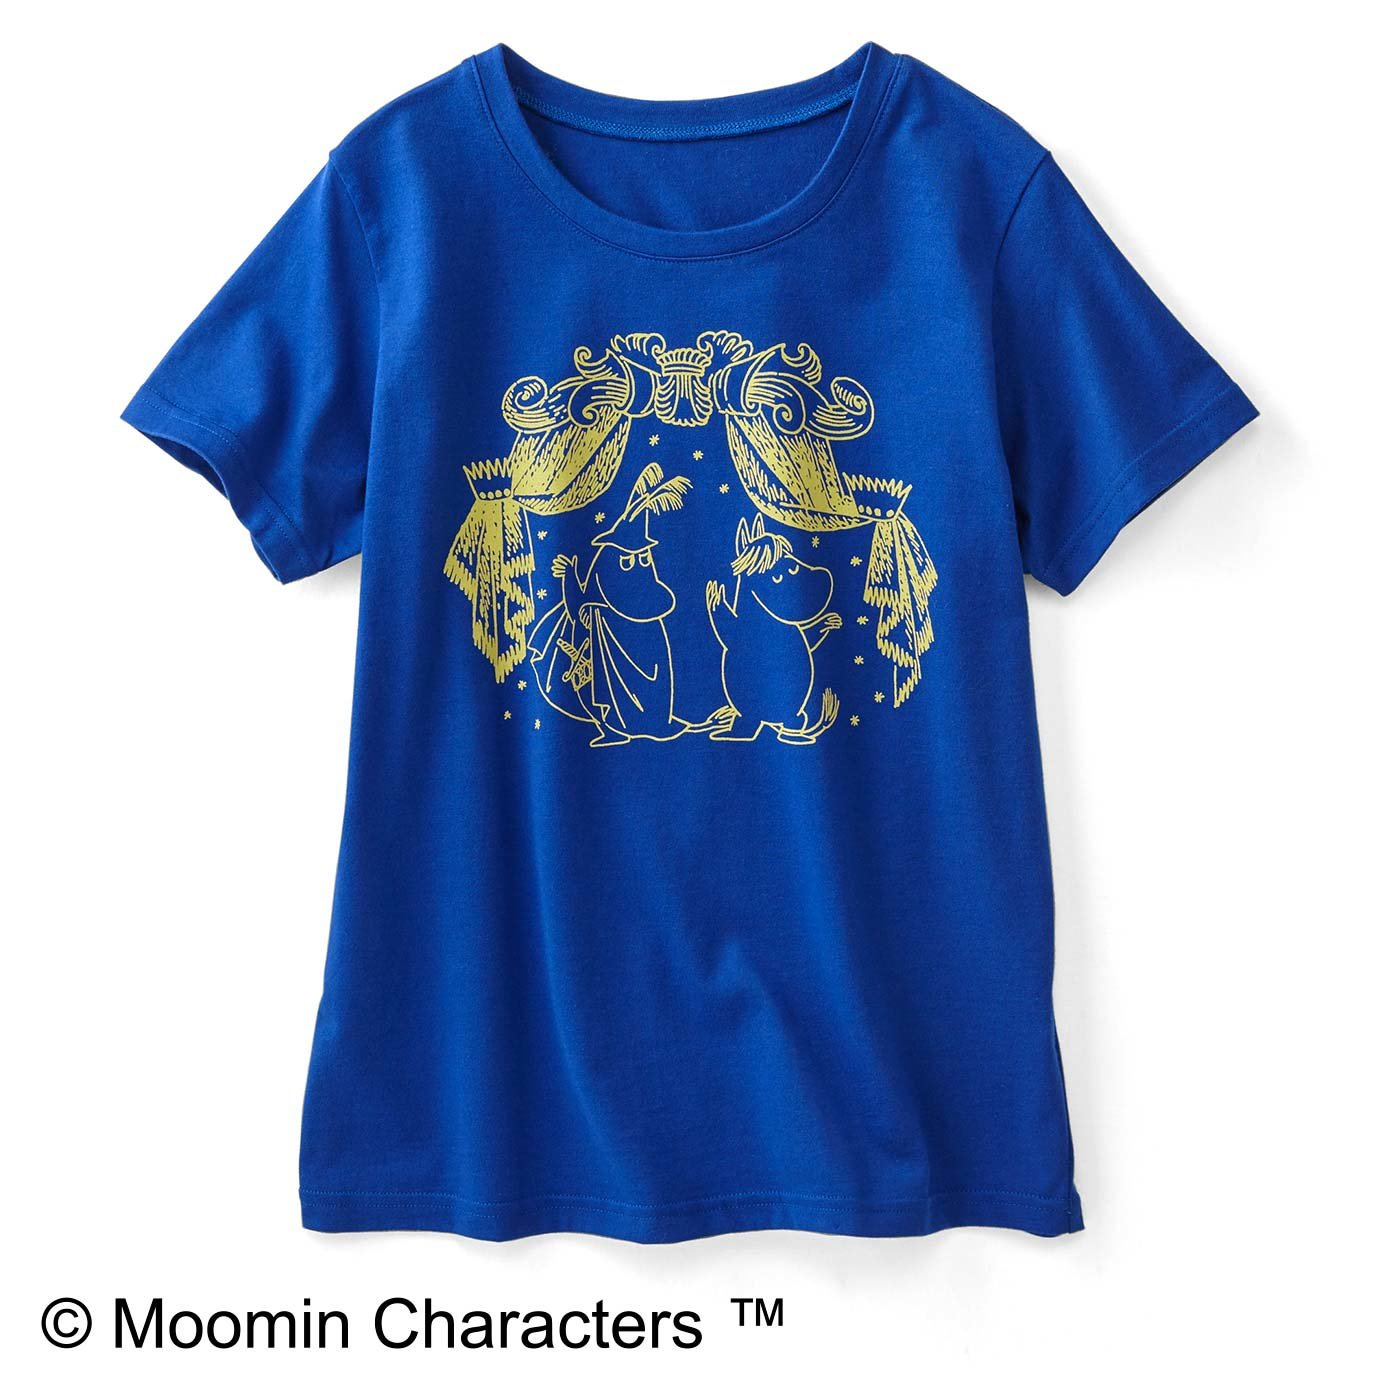 MOOMIN ムーミンと仲間たち シンプルプリントがかわいいTシャツ〈踊るふたり〉